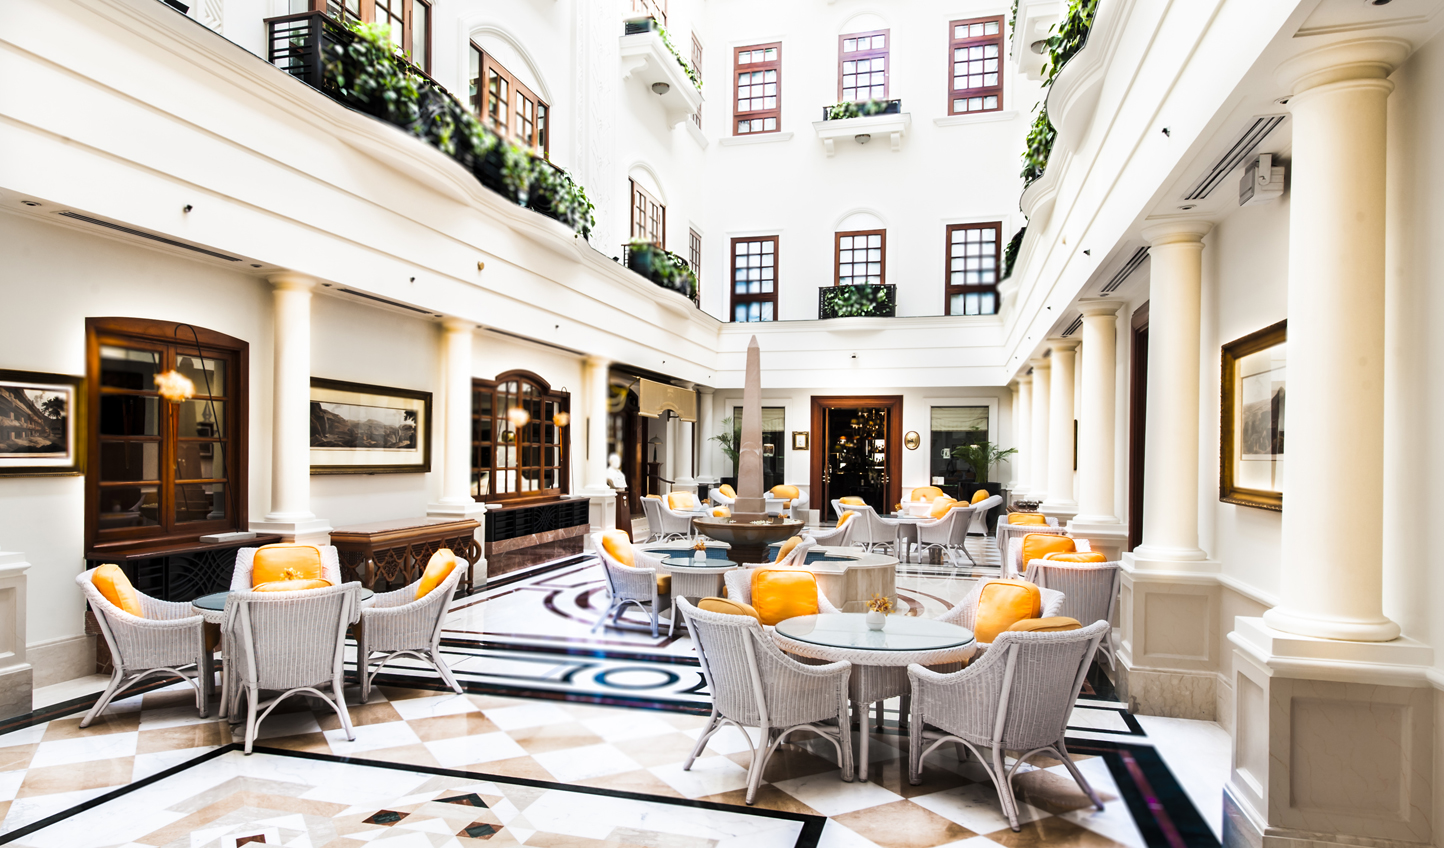 Take tea in The Atrium Tea Lounge